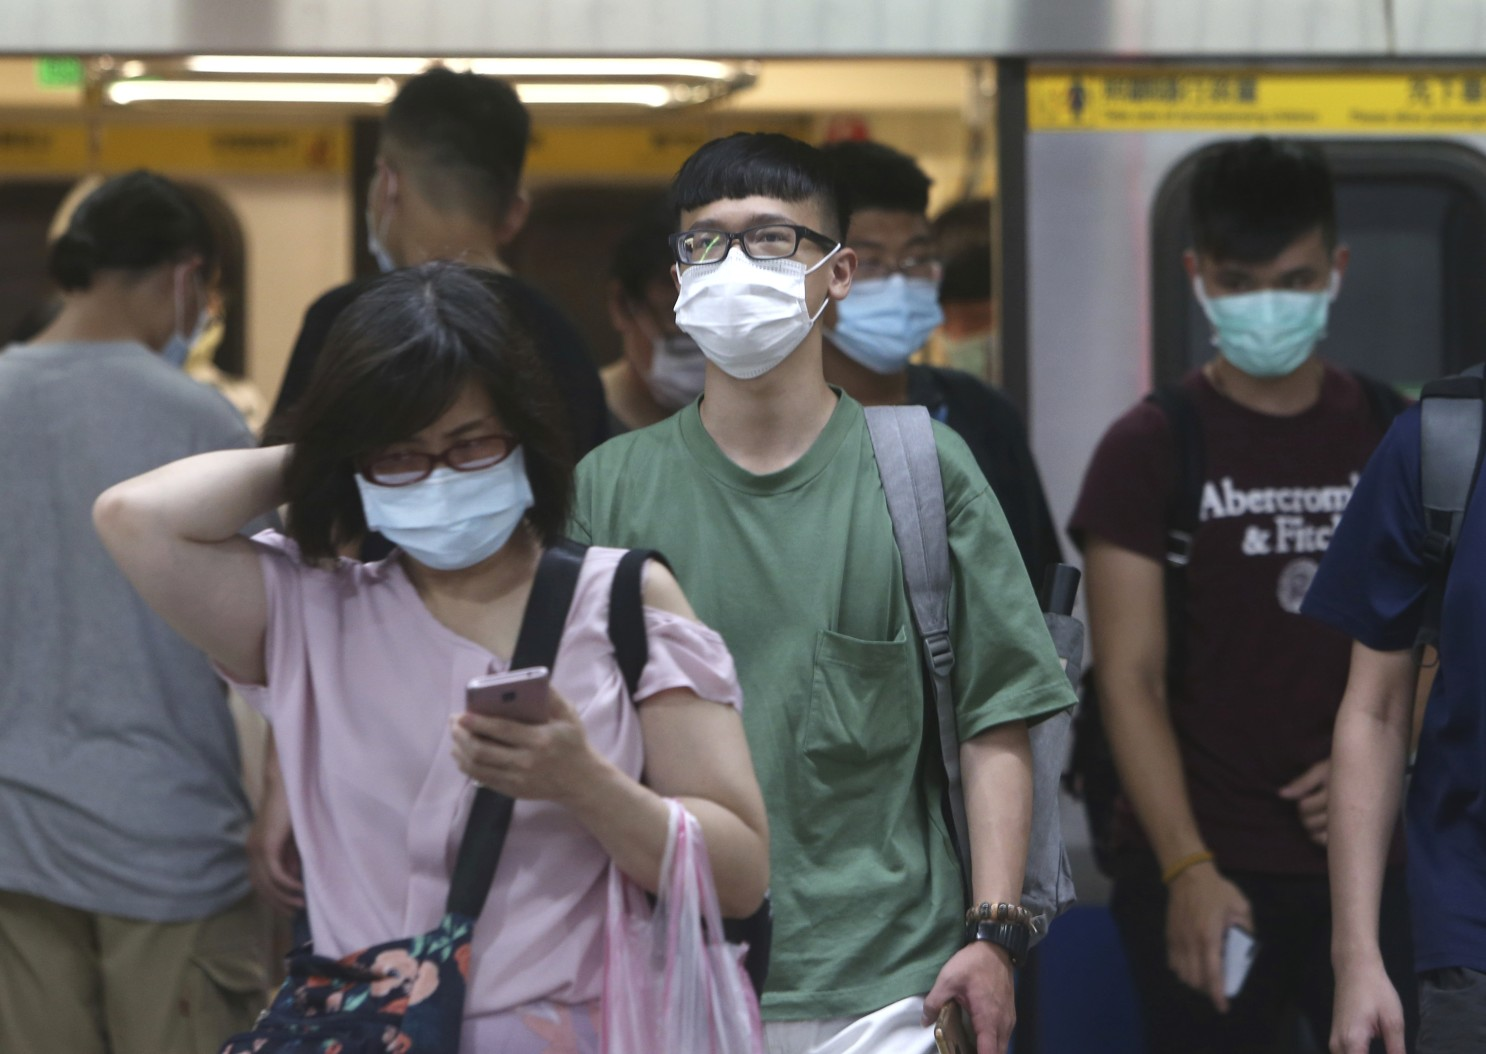 asians wearing masks at a train station